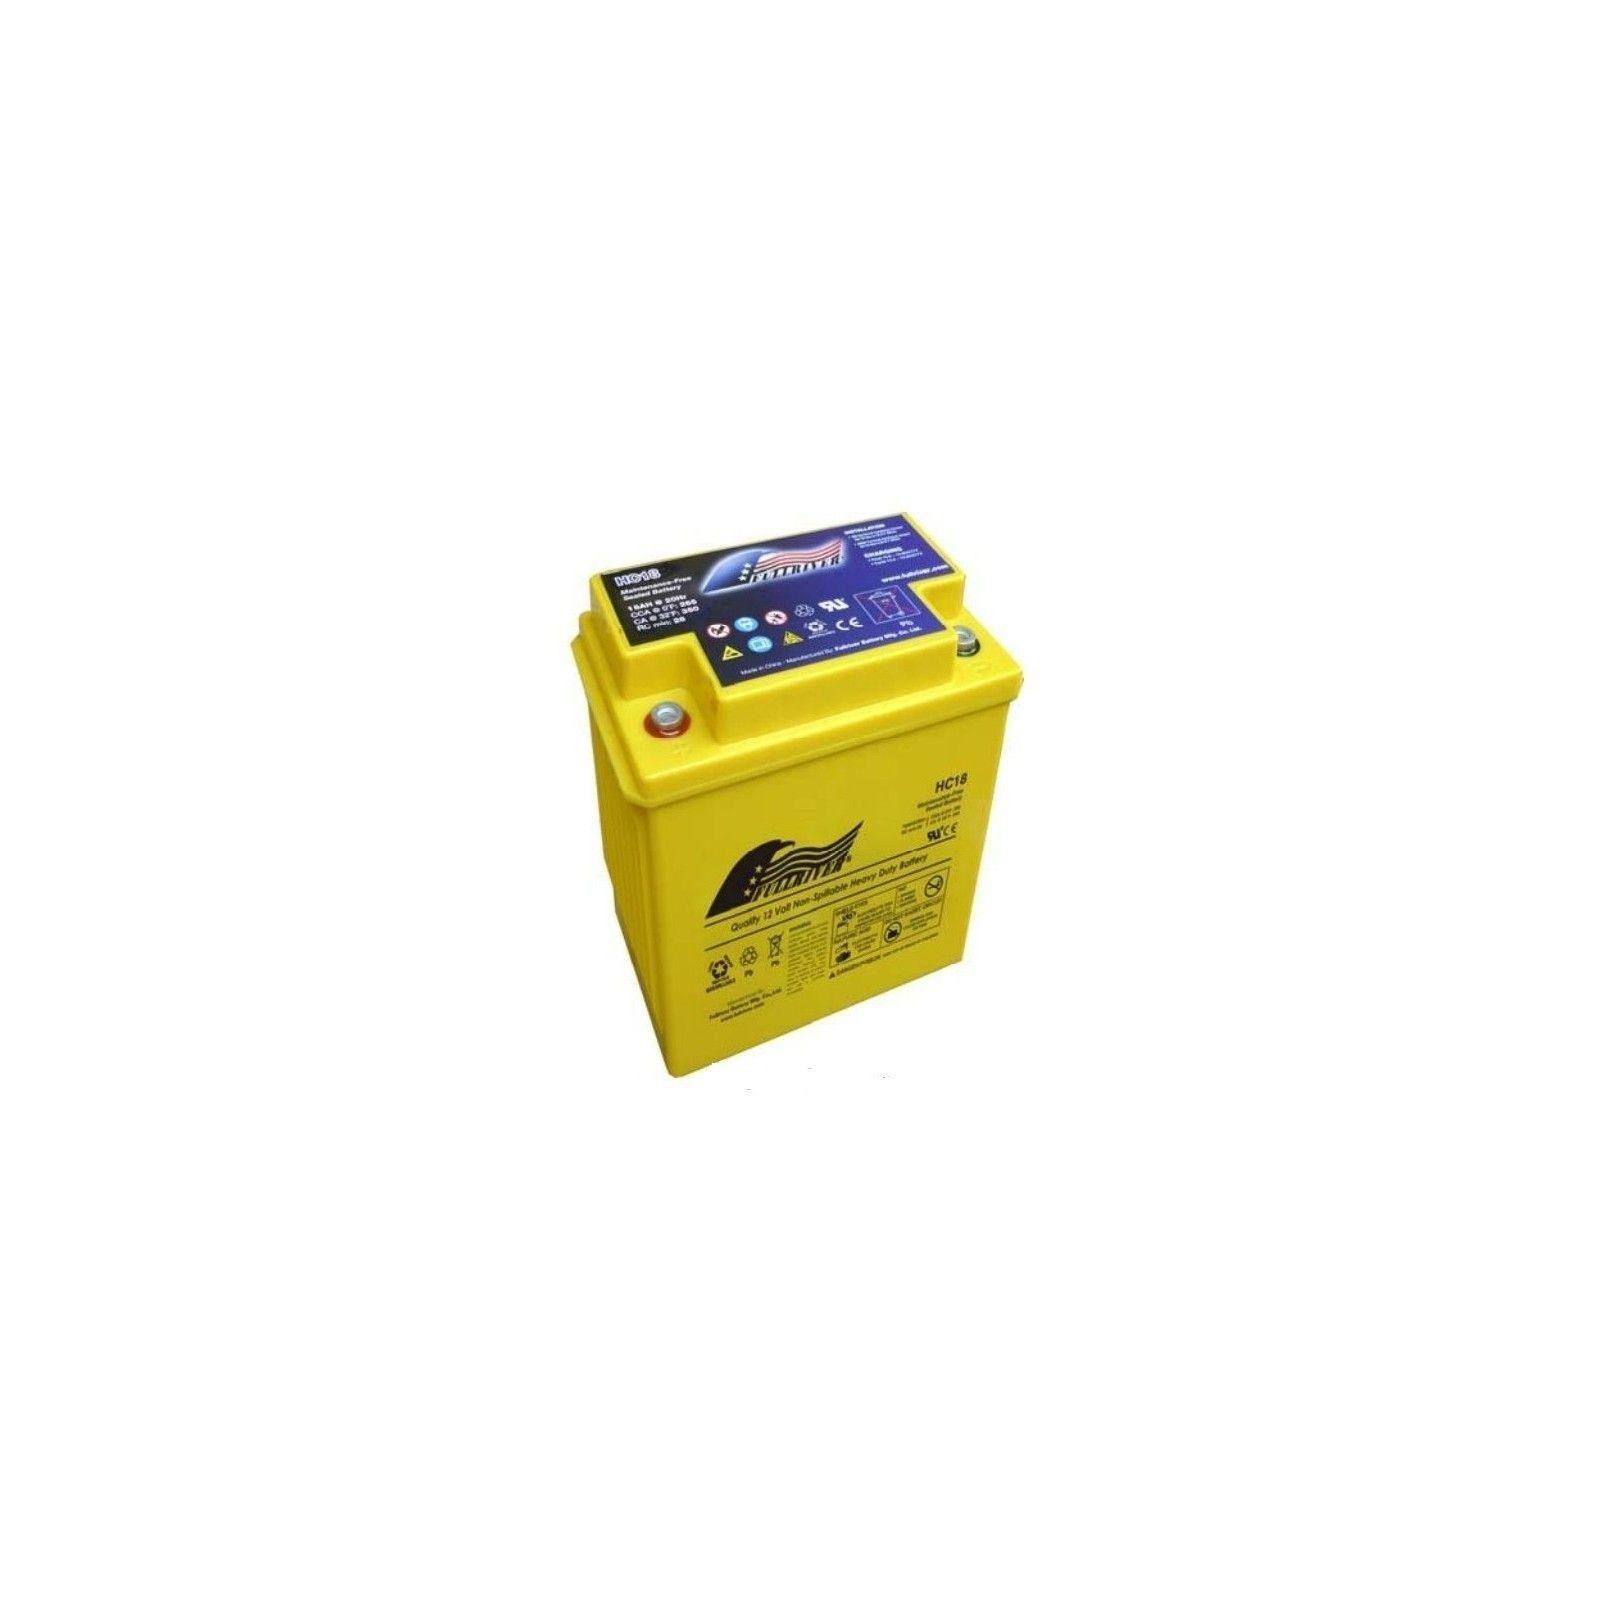 BATERIA Fullriver FULLRIVER HC18 18Ah 265A 12V FULLRIVER - 1